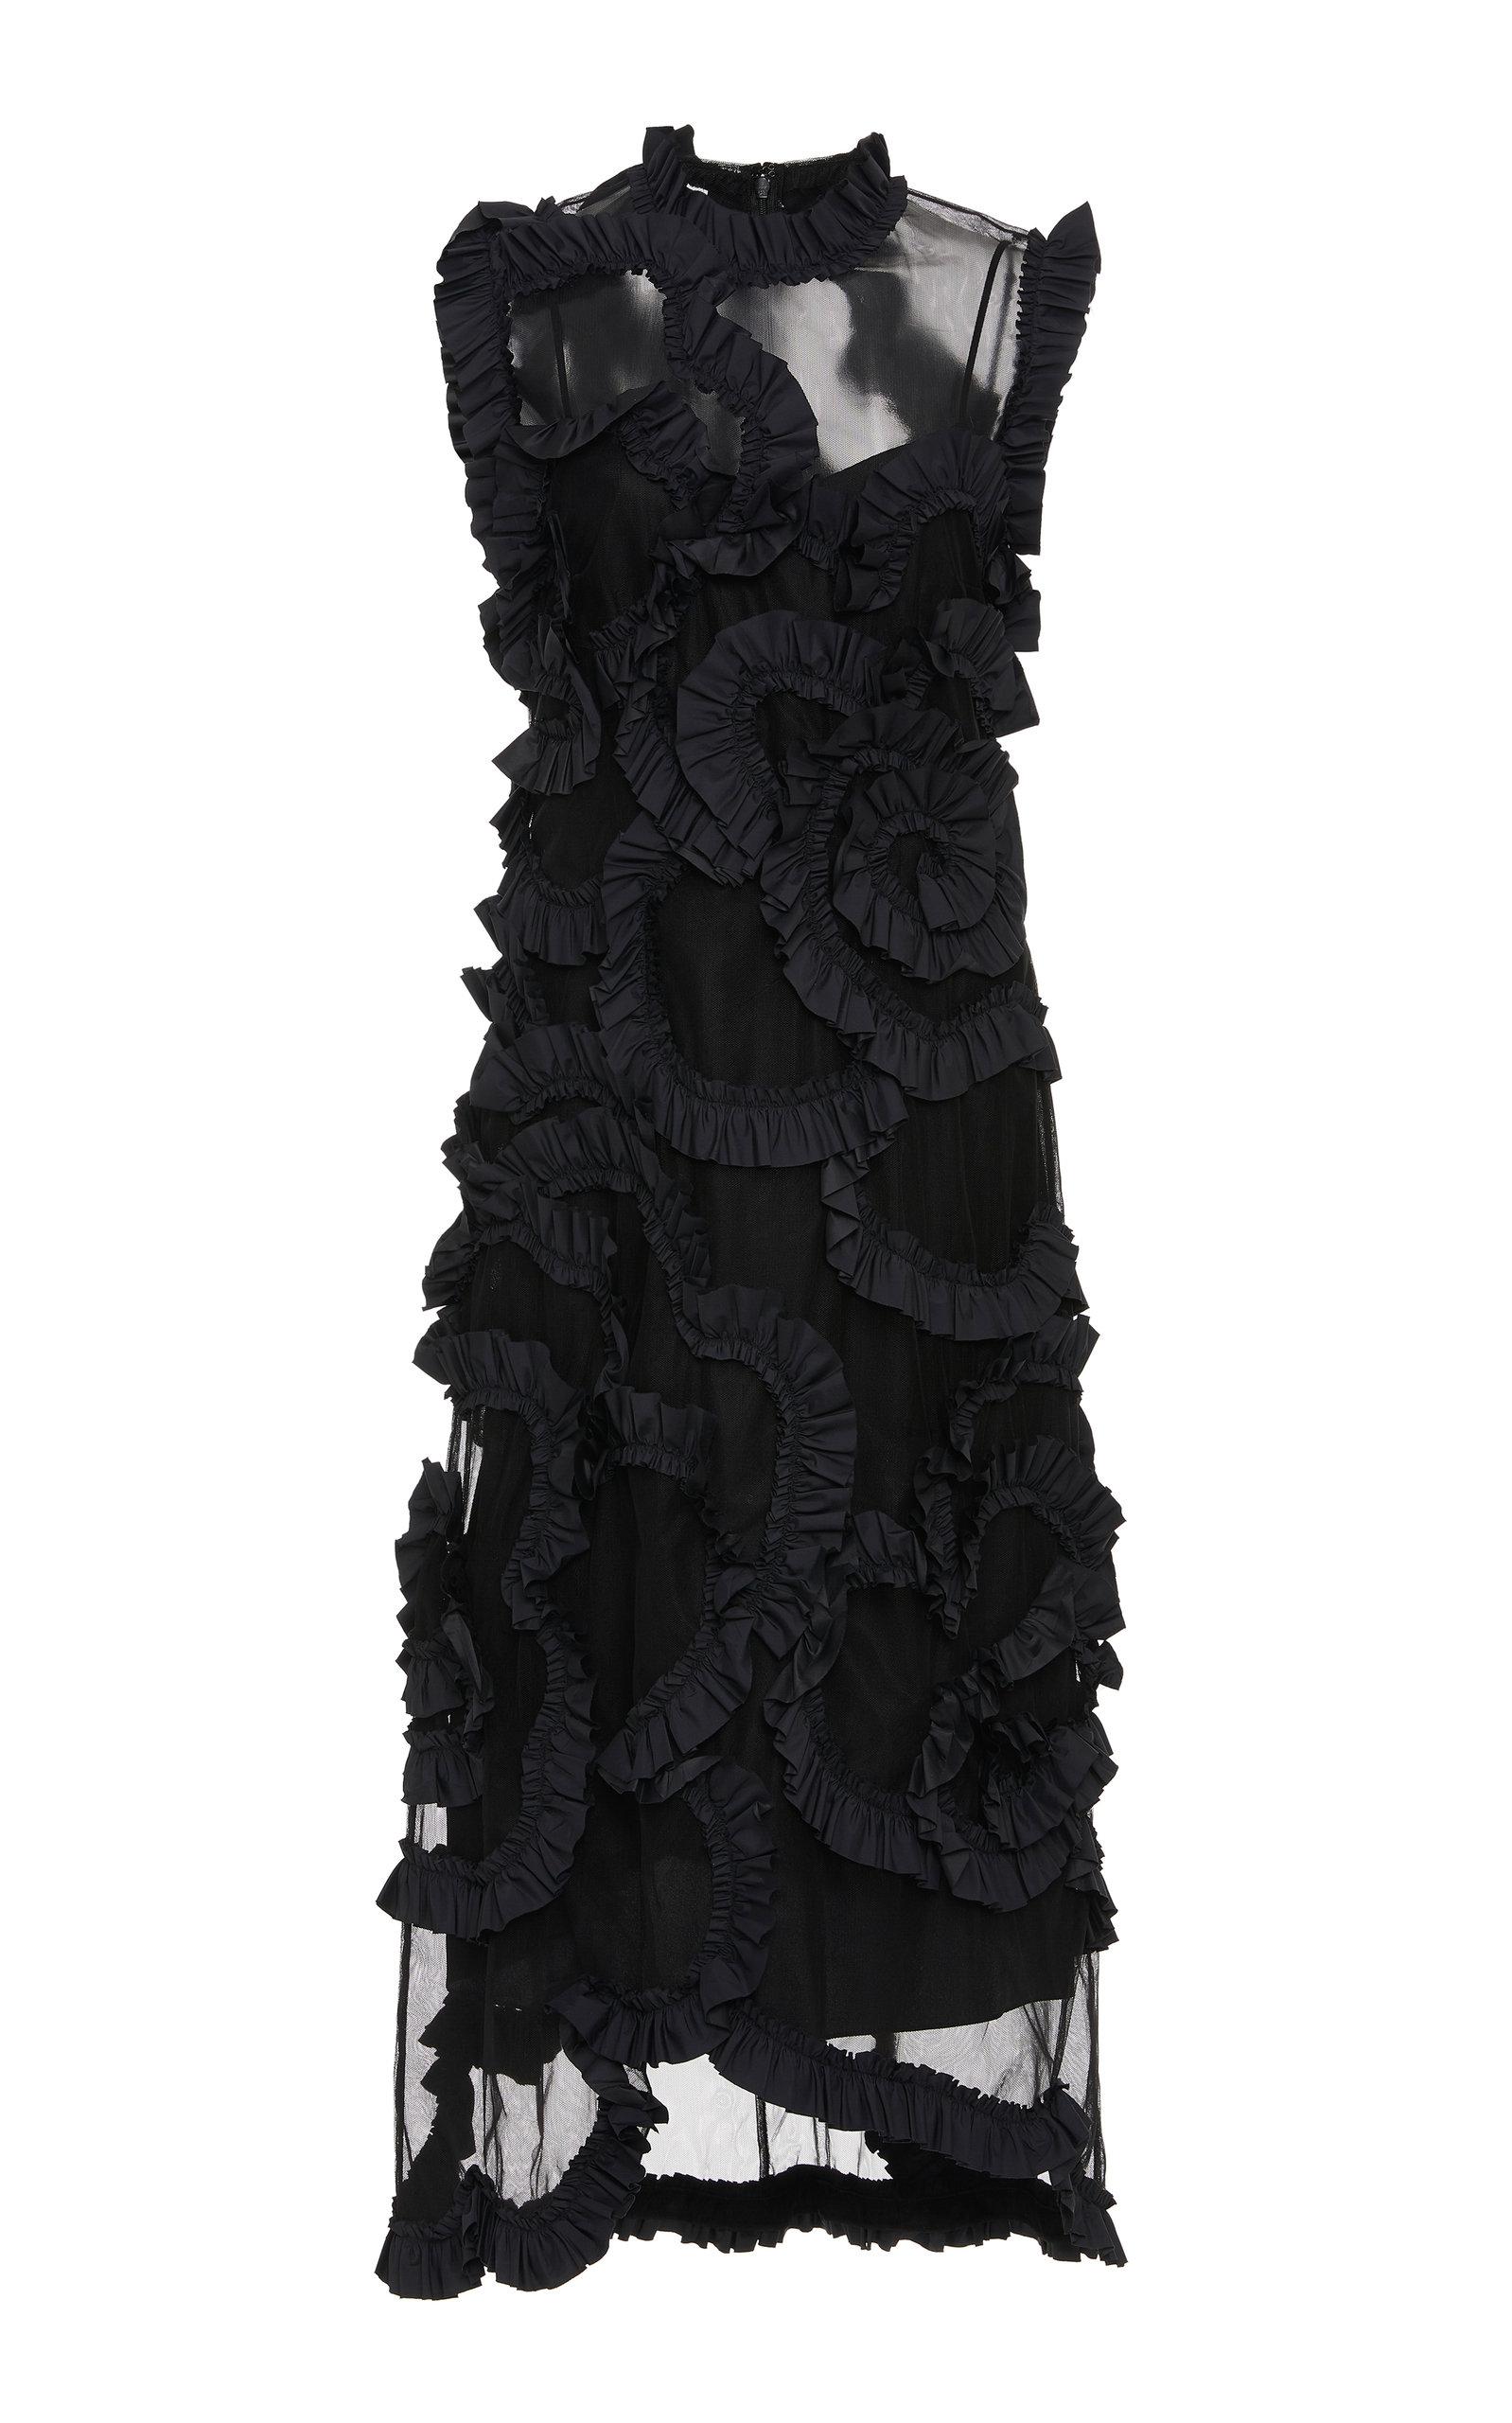 Buy Moncler Genius + Simone Rocha Ruffled Silk-Chiffon Midi Dress online, shop Moncler Genius at the best price